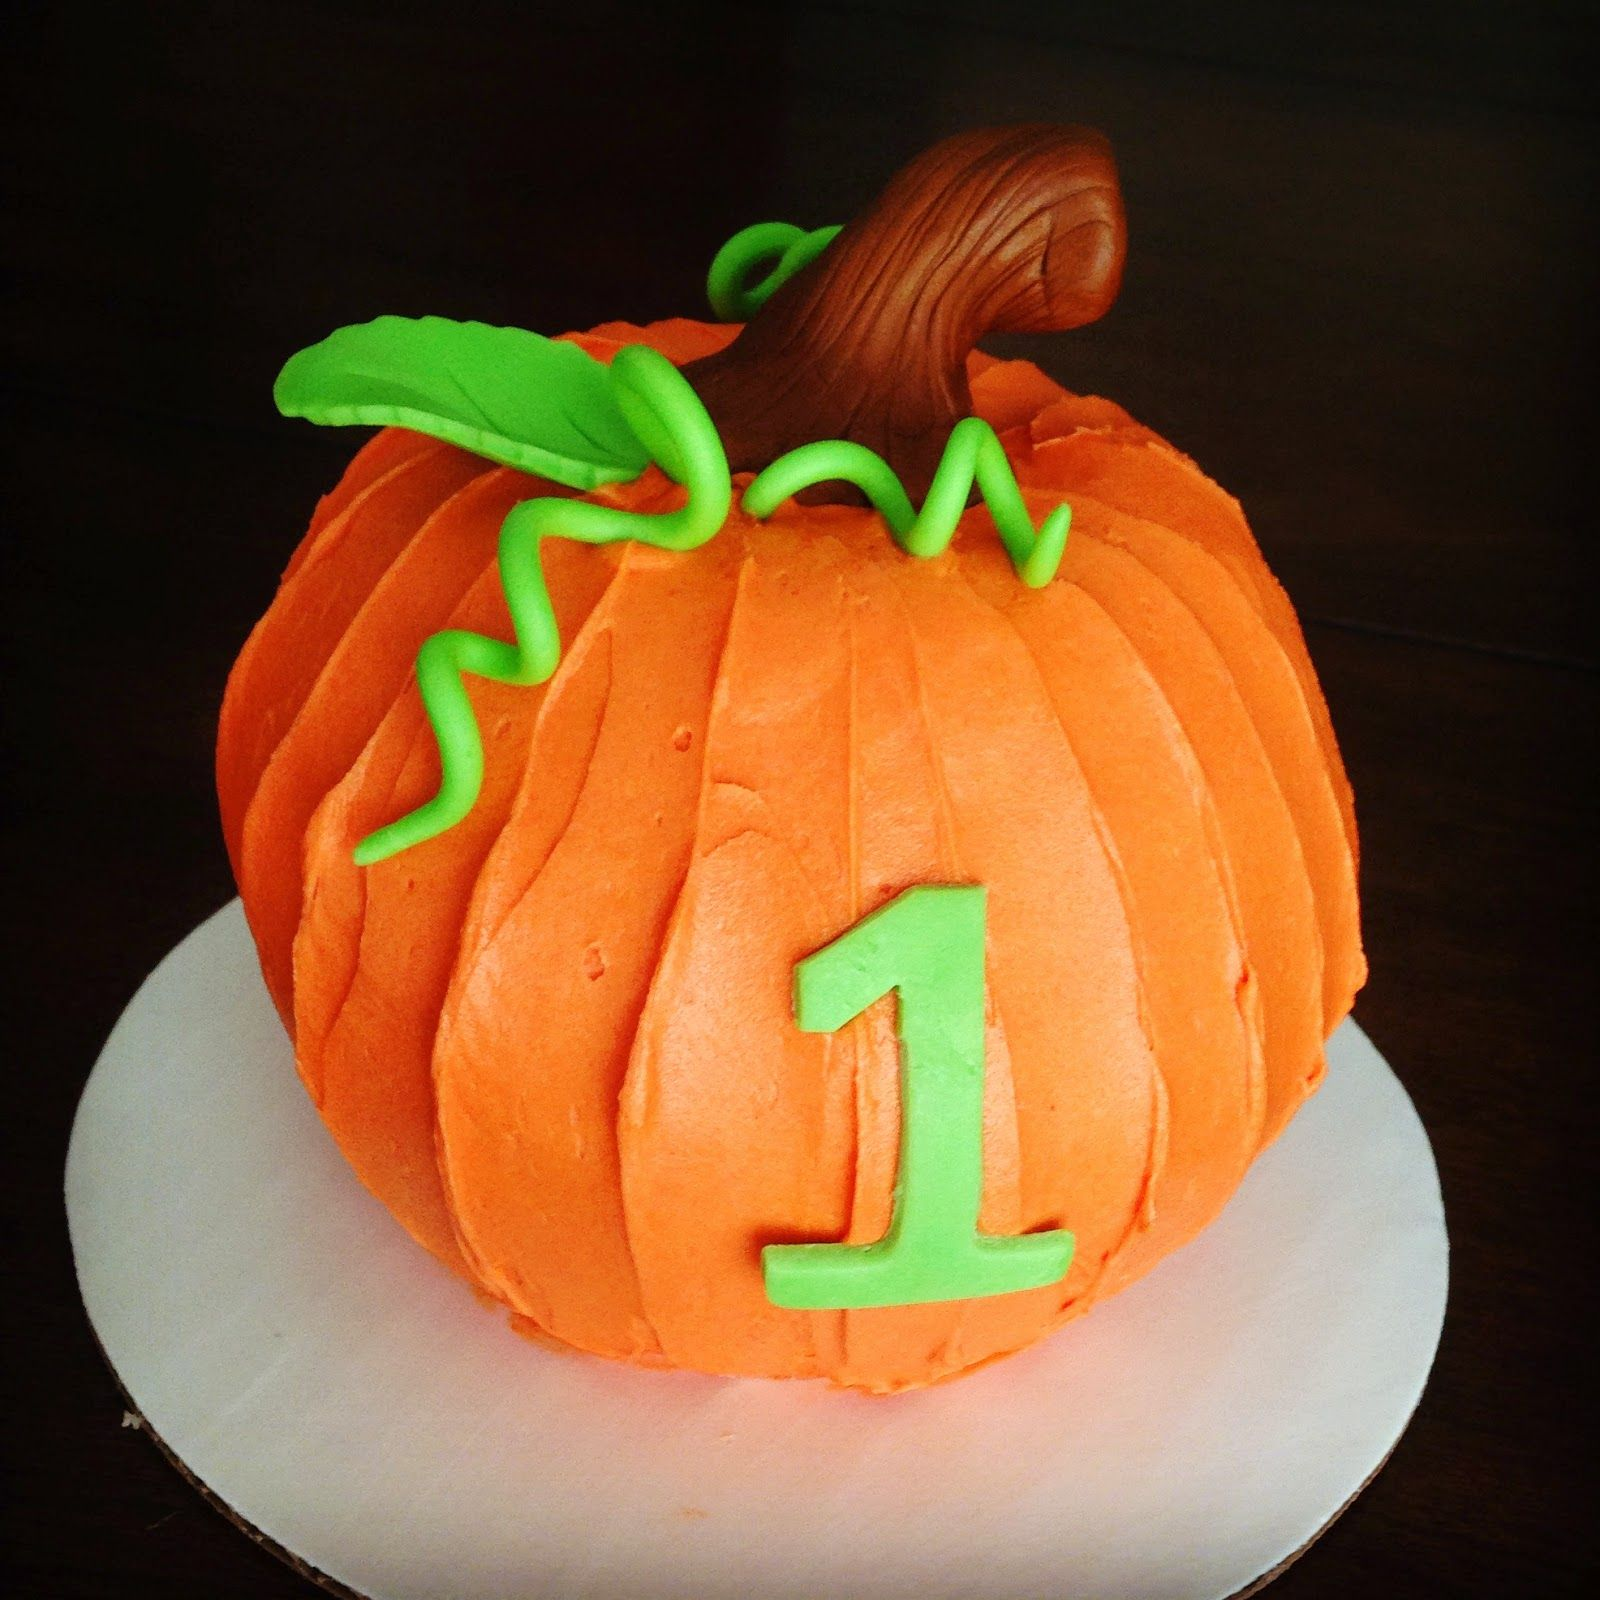 J Adore Gateau 1st Birthday Cake